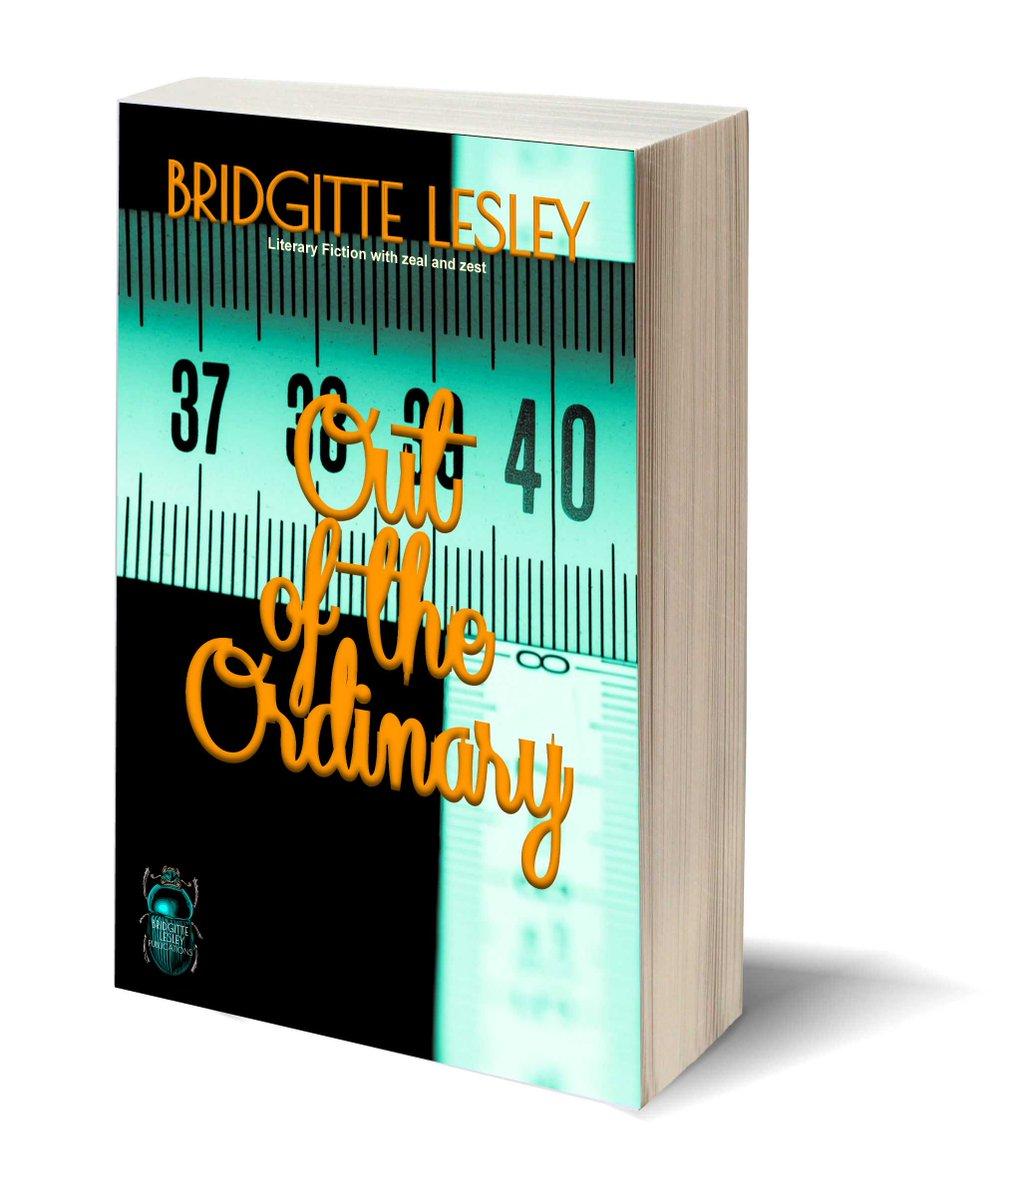 "Stretching the budget to make ends meet! ★OUT OF THE ORDINARY★ Amazon http://amzn.to/2MQe8L4 Smashwords http://bit.ly/2YyAS7V - - - -  pic.twitter.com/t0cs2WODtu #ASMSG #strongwomen ""@BridgitteLesley http://bridgittelesley.wordpress.com/"